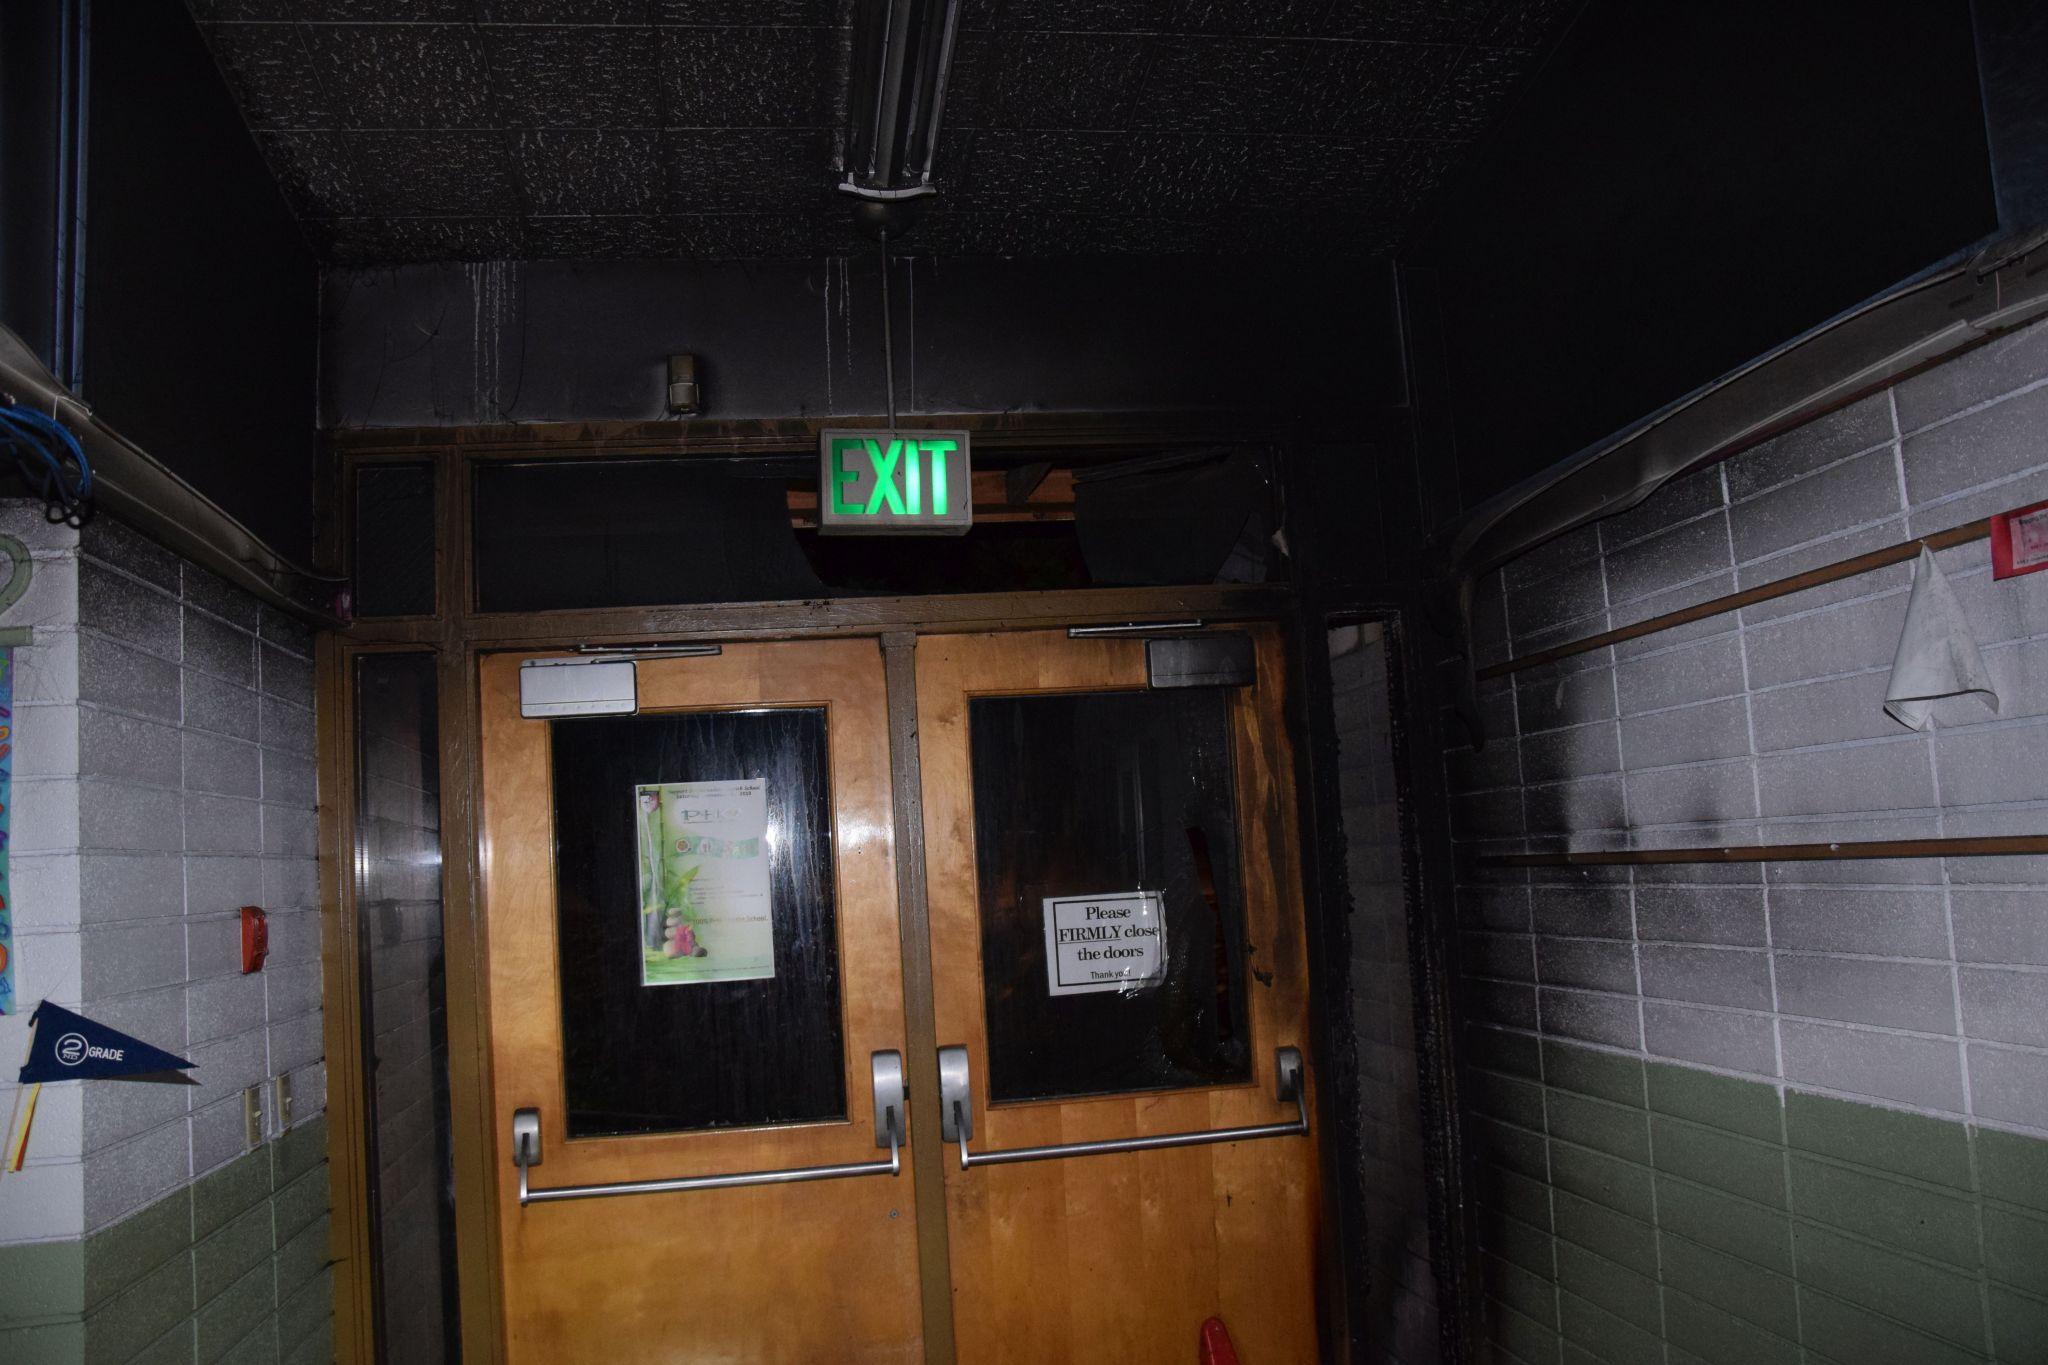 Cash reward offered after Catholic school fire in Burien deemed arson